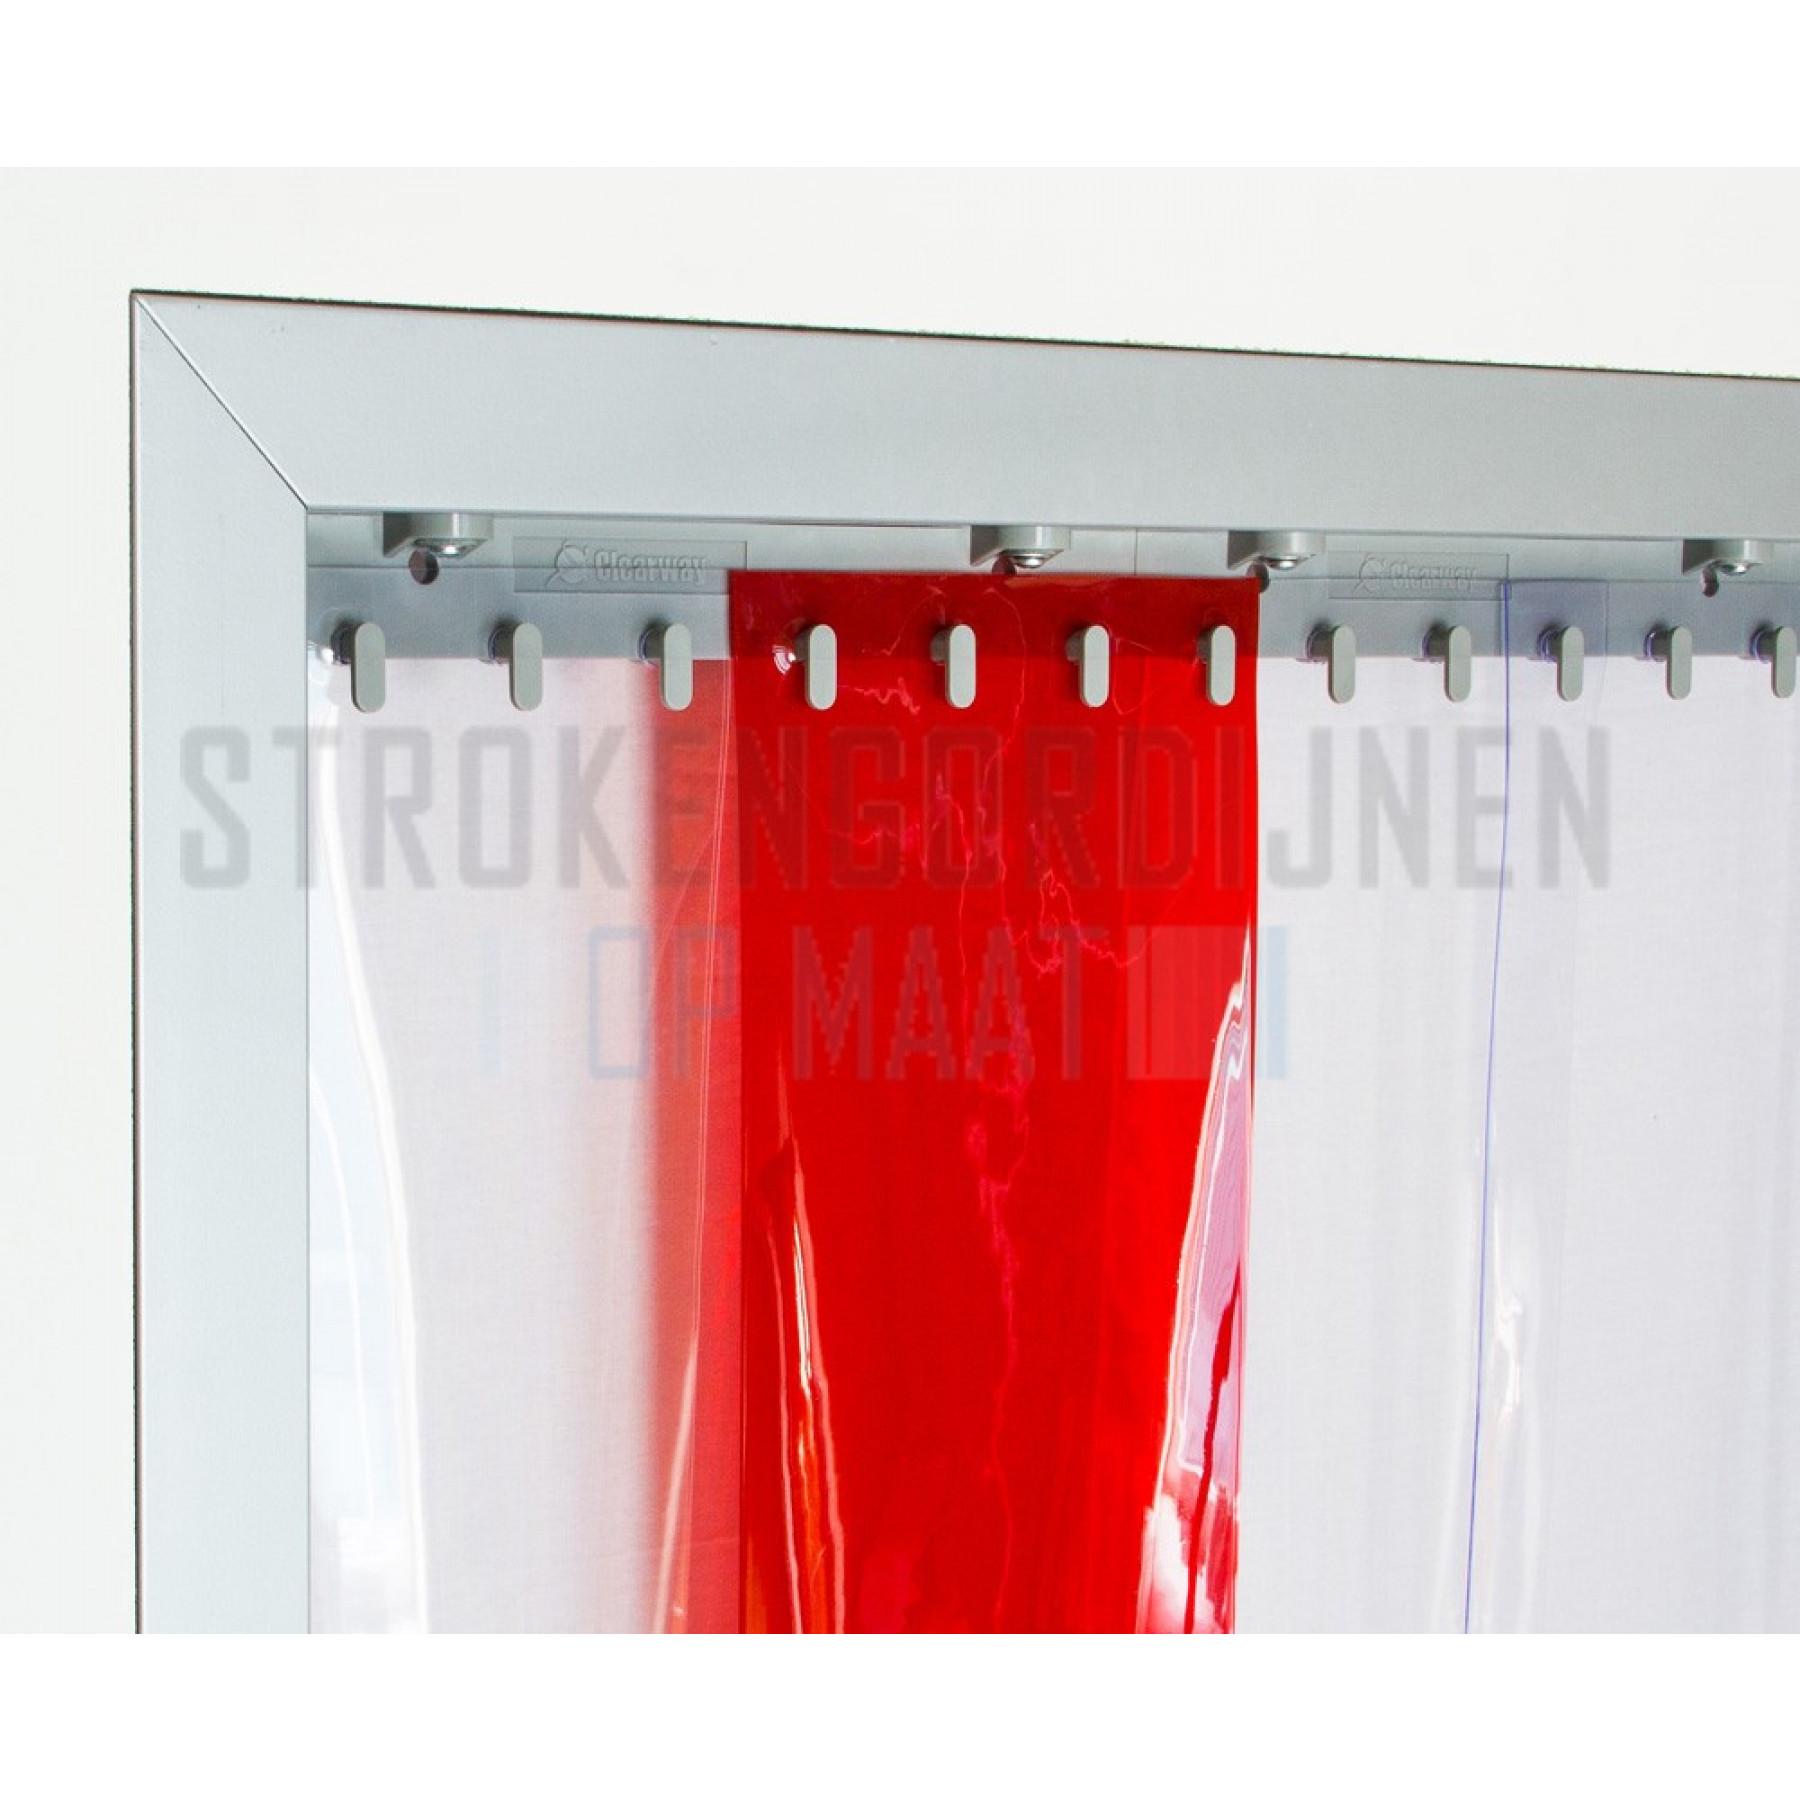 pvc rolle 400mm breit 4mm dick 50 meter lang farbe rot transparent in pvc streifen. Black Bedroom Furniture Sets. Home Design Ideas